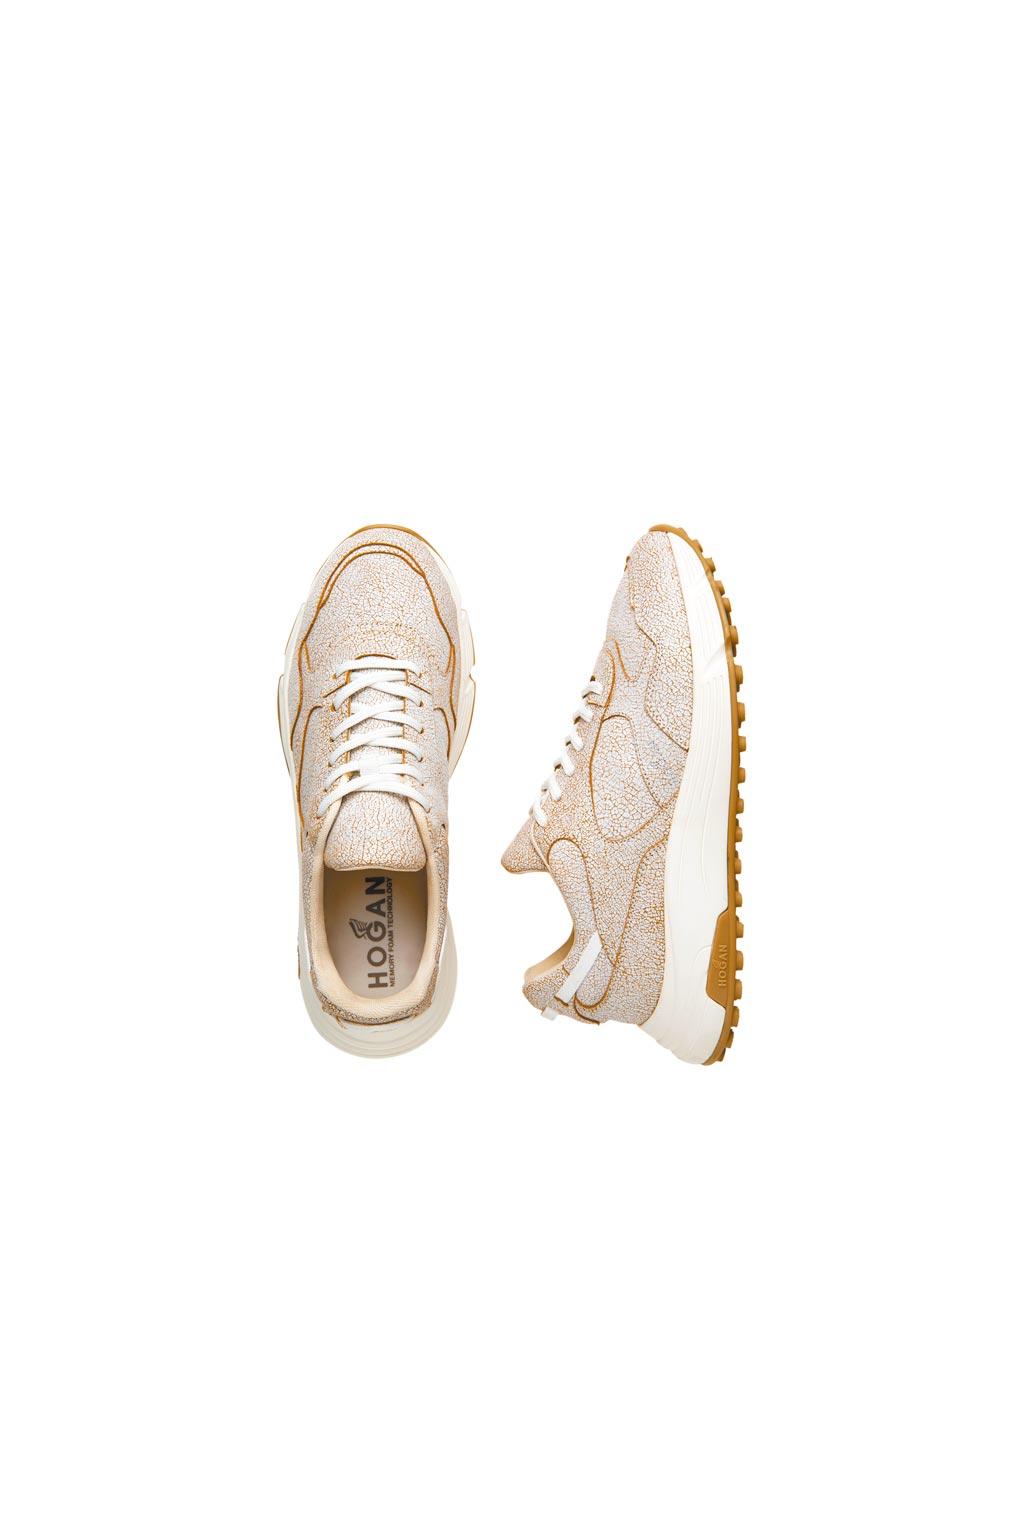 HOGAN Hyperlight金色爆裂紋休閒鞋,1萬9600元。(HOGAN提供)